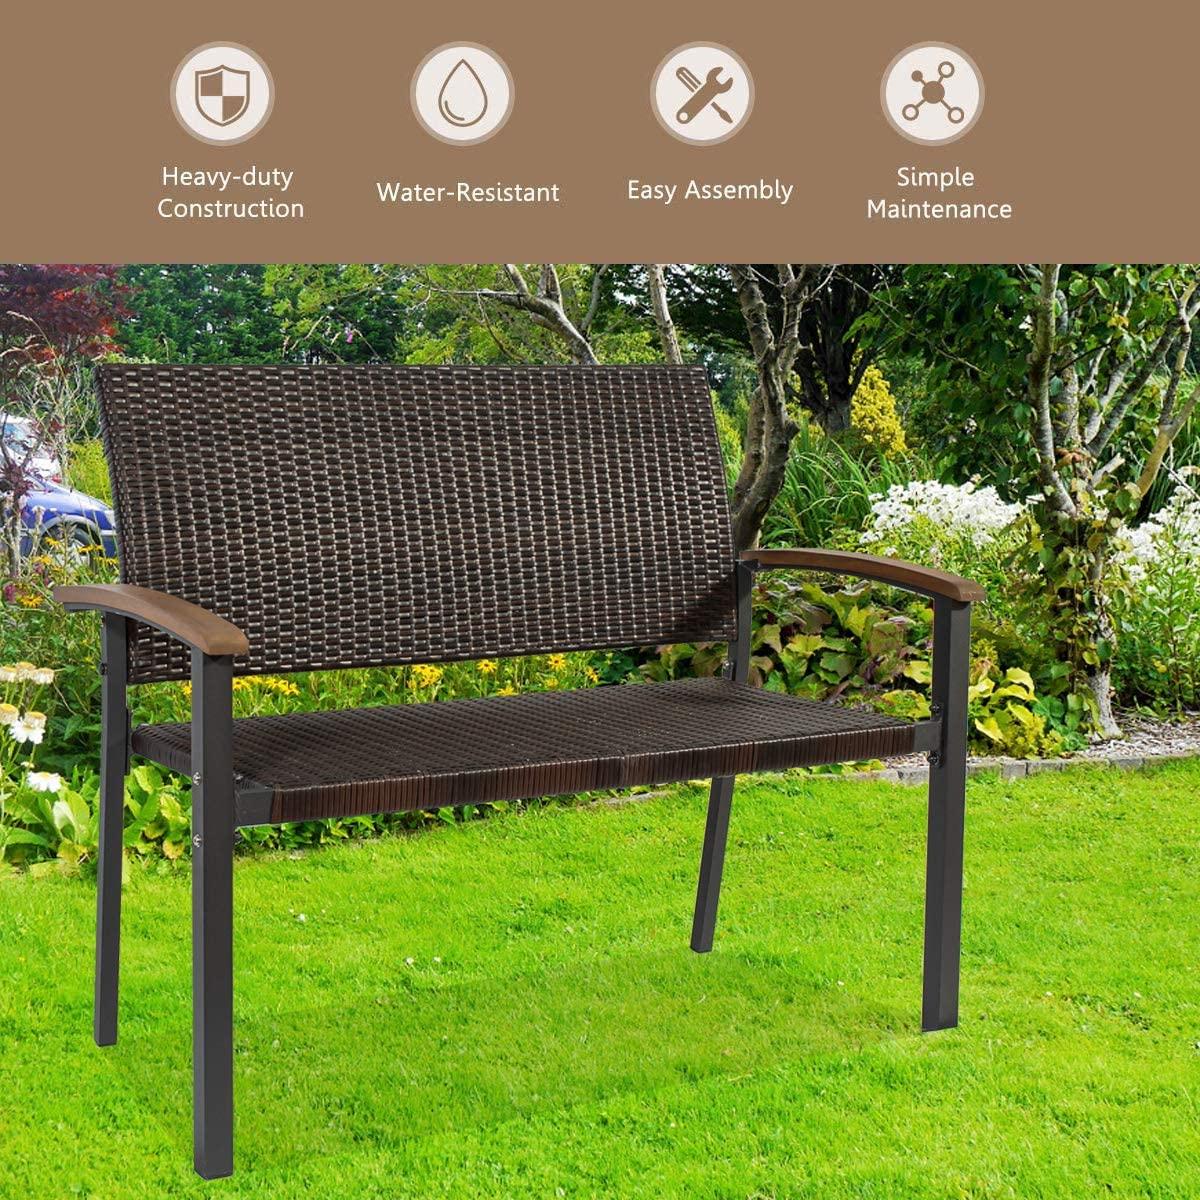 Patio Furniture SetRattan Bench Outdoor Wicker Rattan Chair Rattan Double Sets Bench for Pool Backyard Lawn